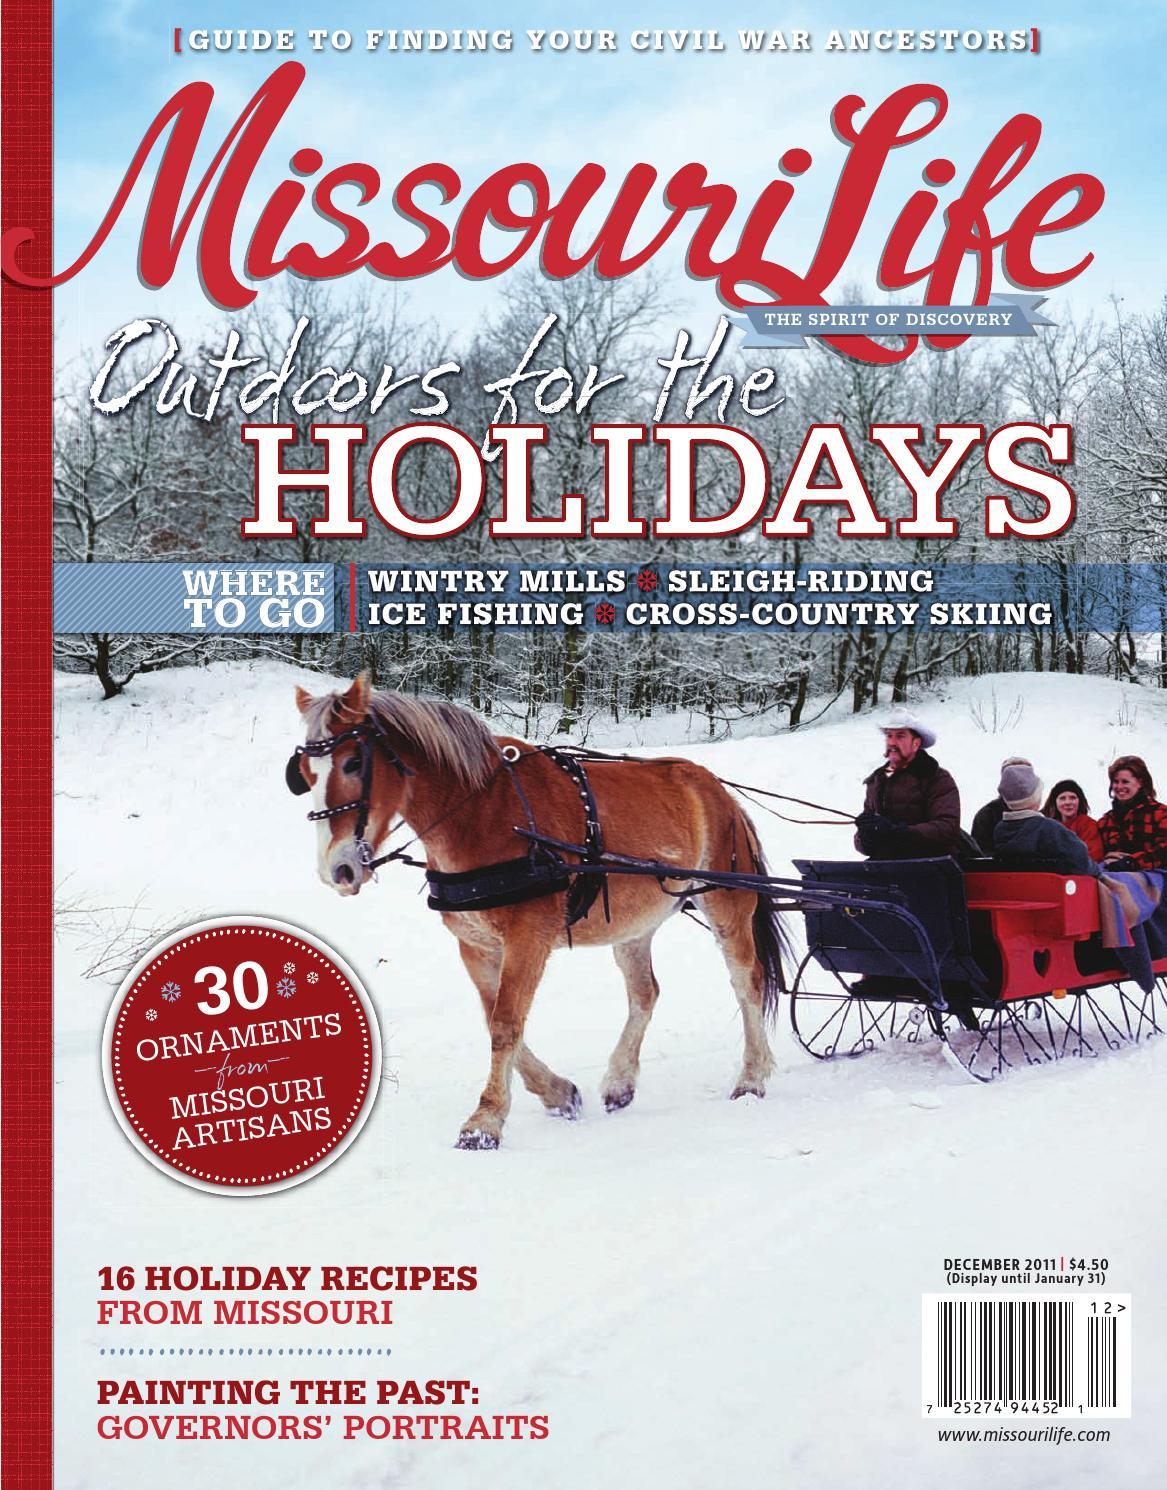 Missouri Life December 2011 January 2012 By Magazine Rodeo Bundling 5 Issuu